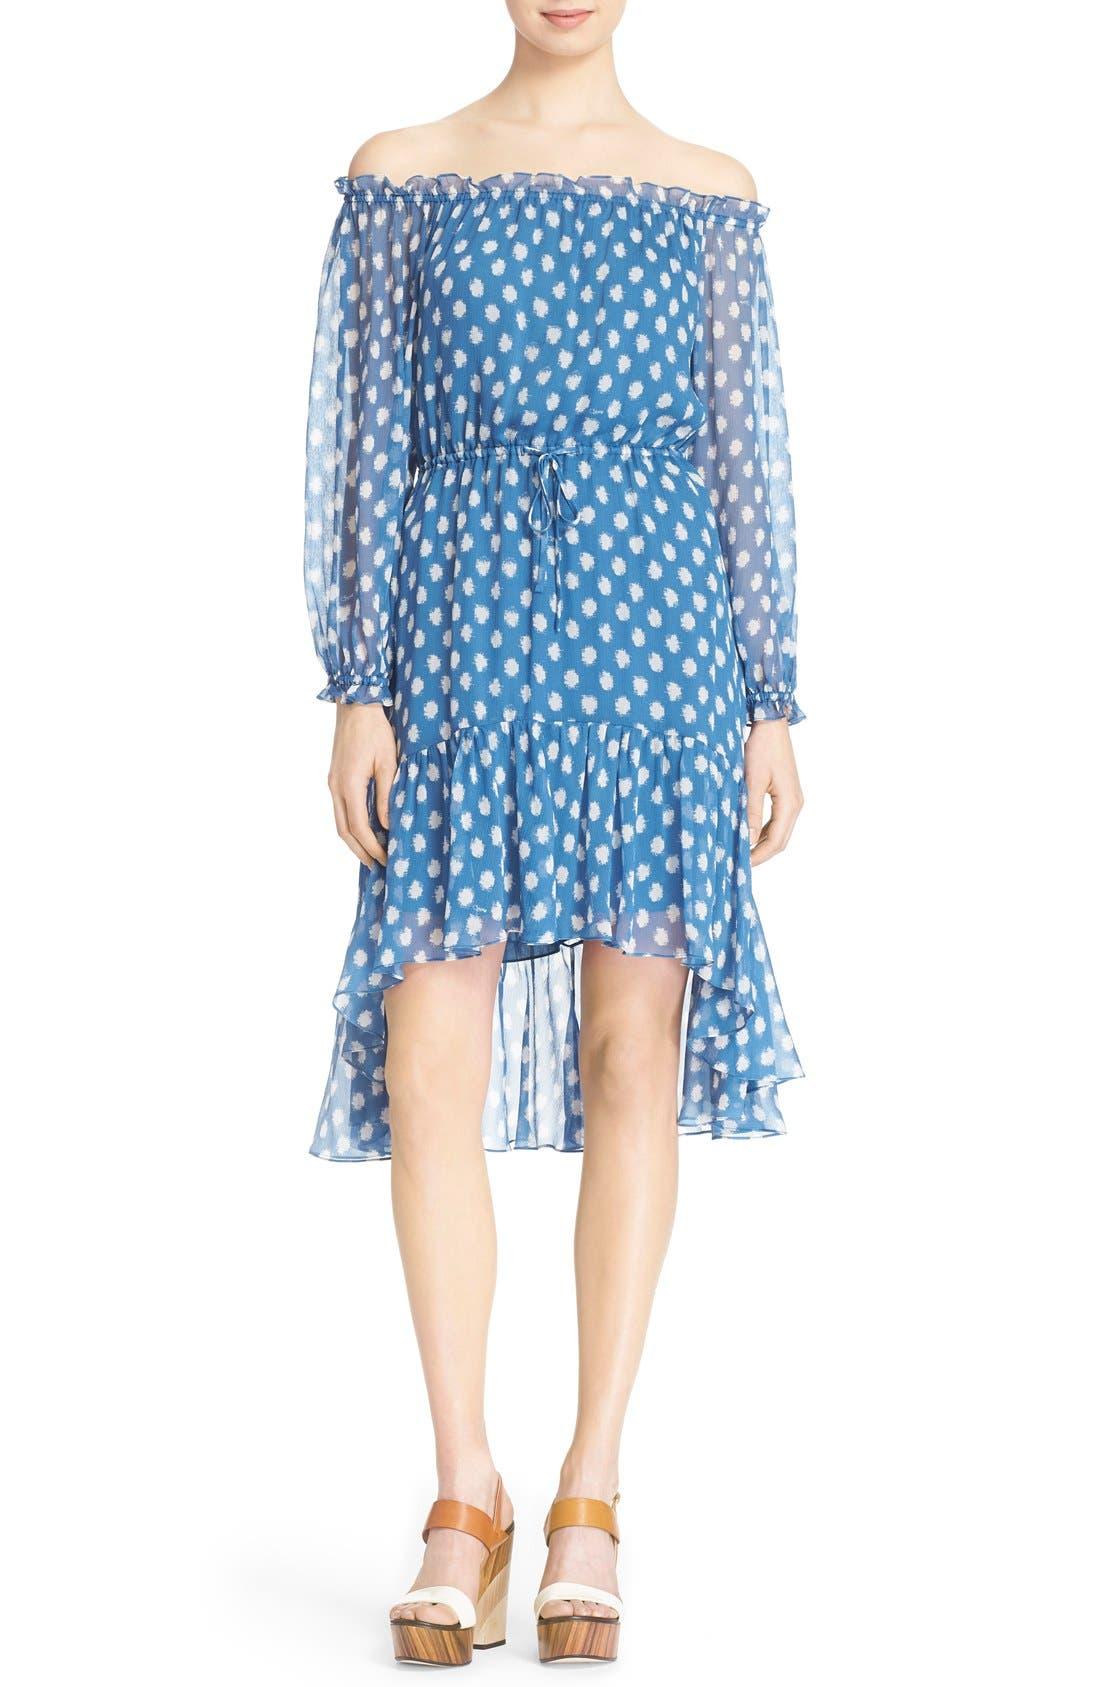 Main Image - Diane von Furstenberg 'Camila Two' Off the Shoulder Polka Dot Silk Dress